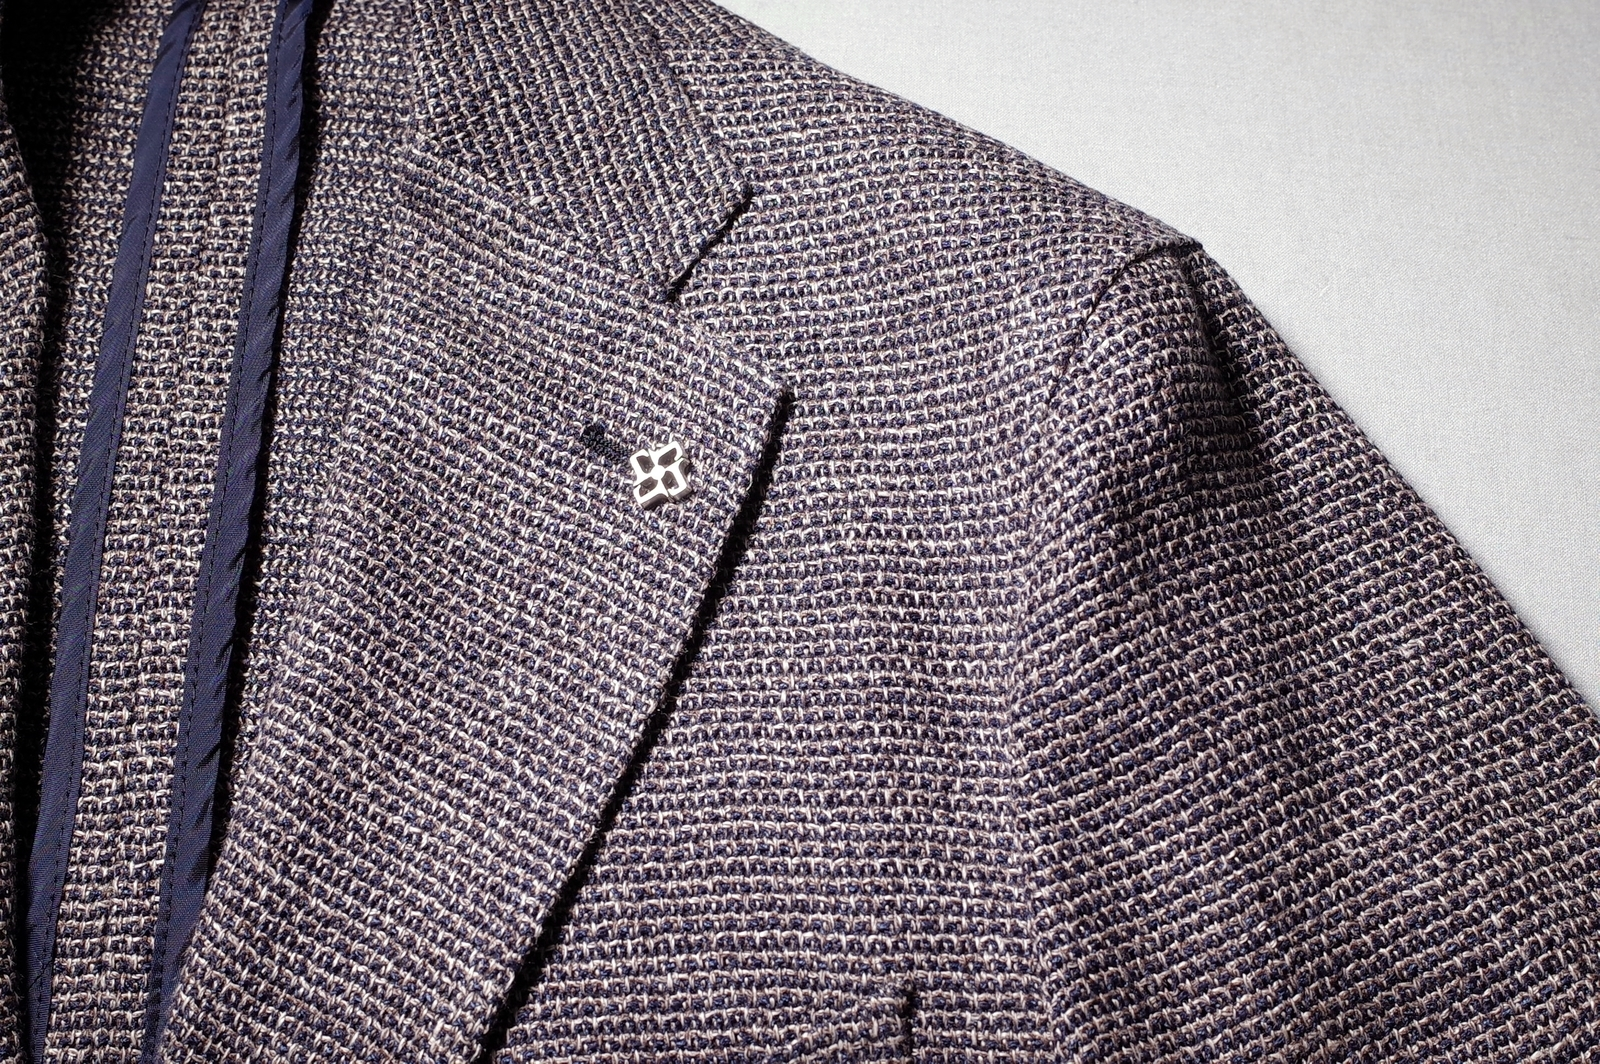 f:id:suits:20200719225955j:plain